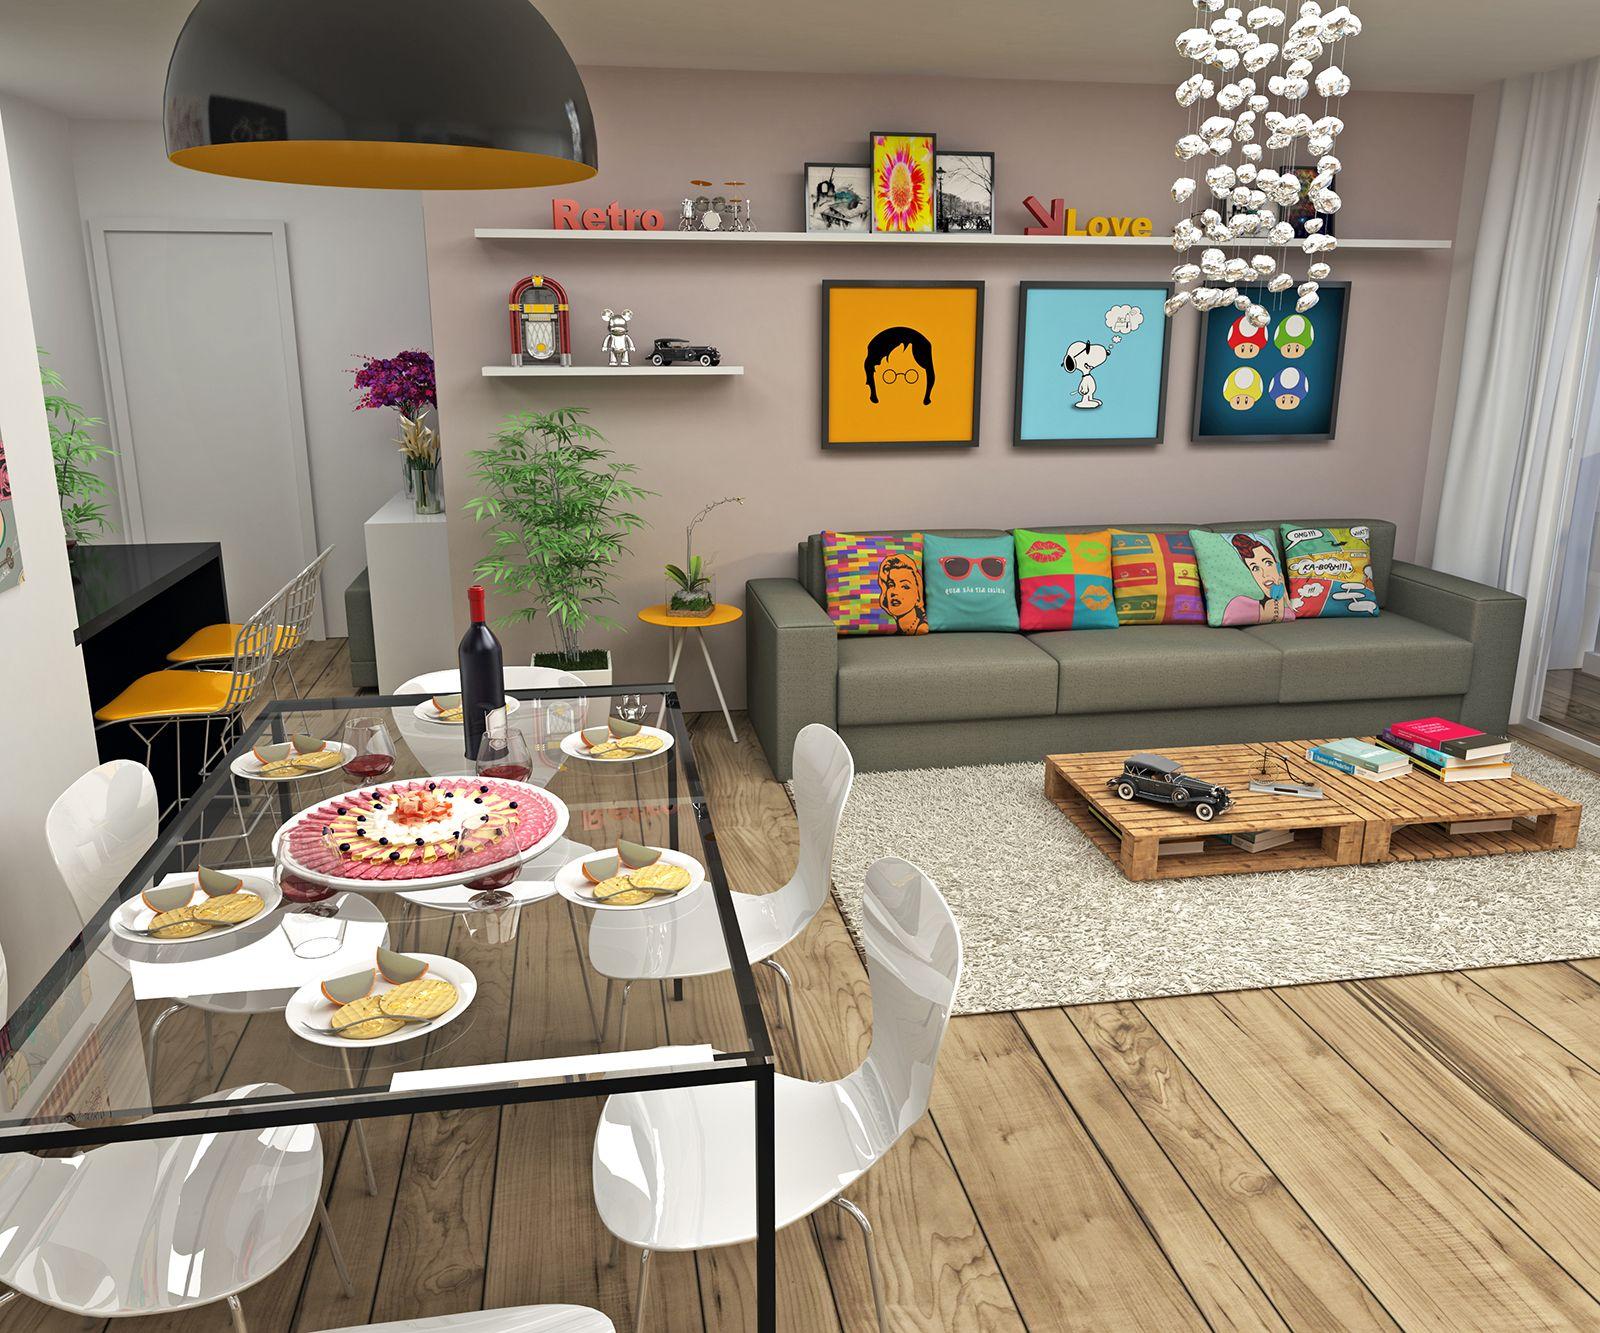 #B1751A  Salas no Pinterest Salas de estar Laranja e Pintura revere pewter 1600x1333 píxeis em Decoraçao De Sala De Estar Colorida